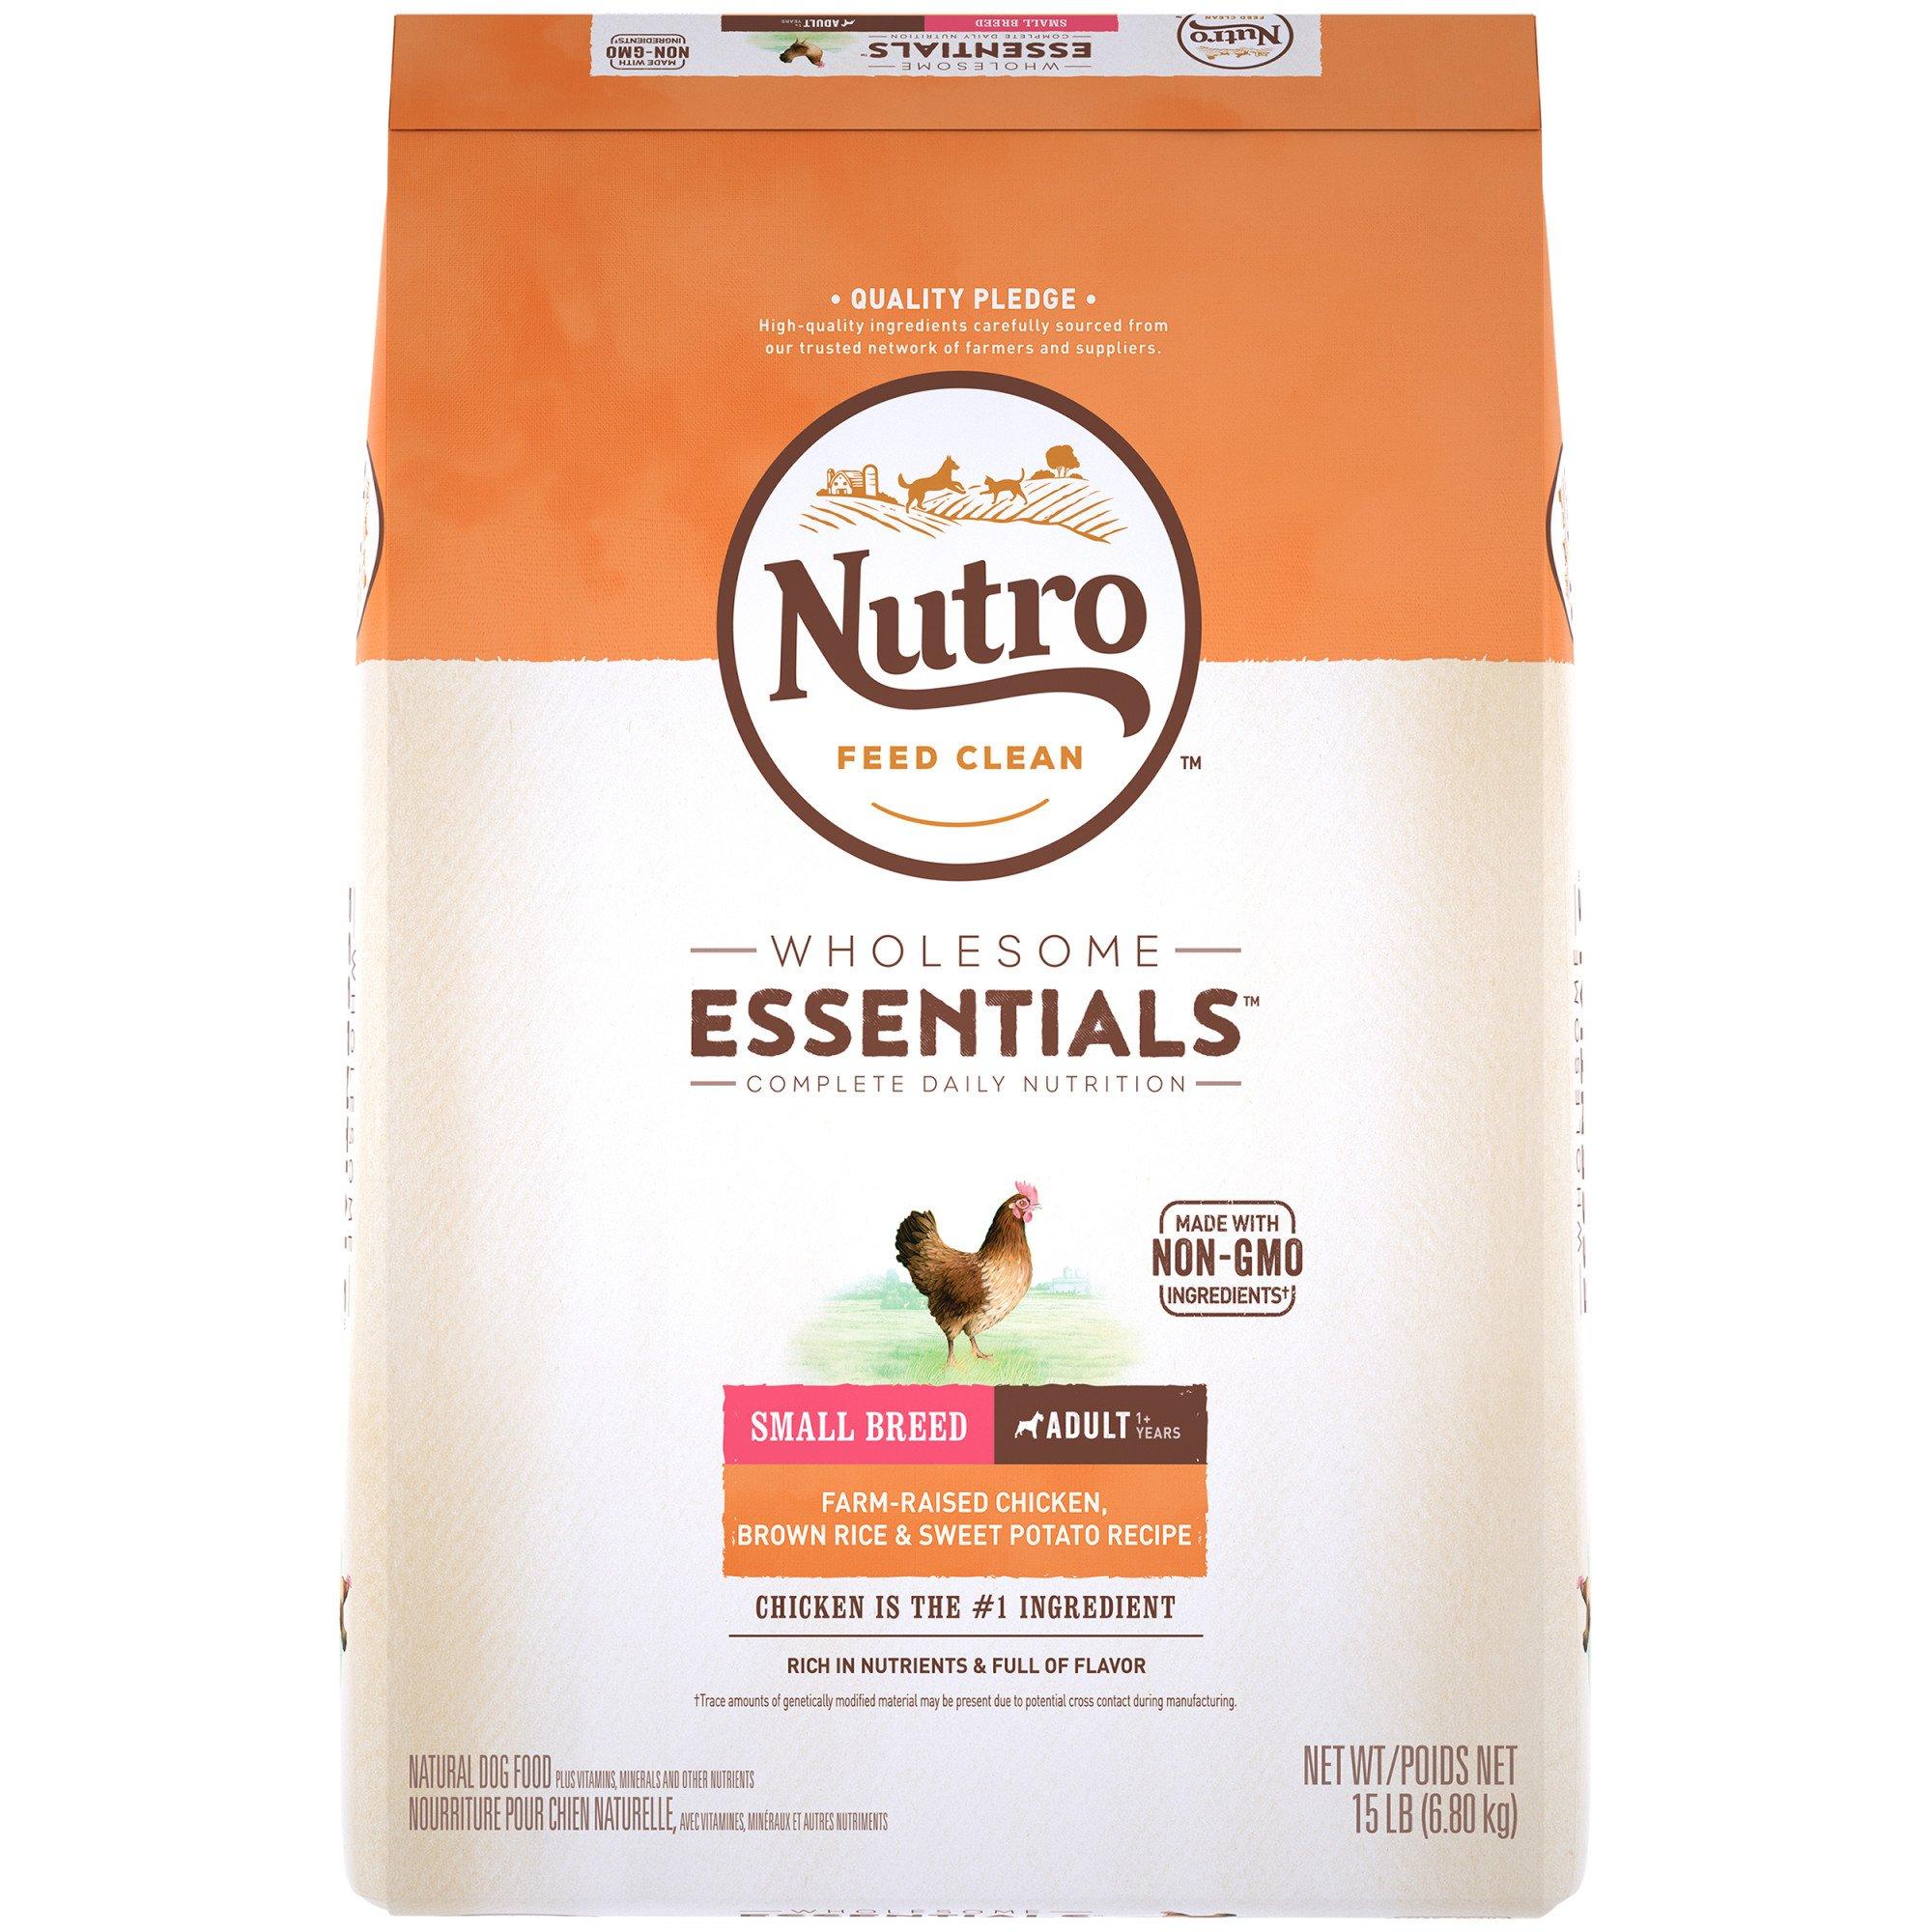 Nutro Natural Choice Small Breed Adult Dog Food